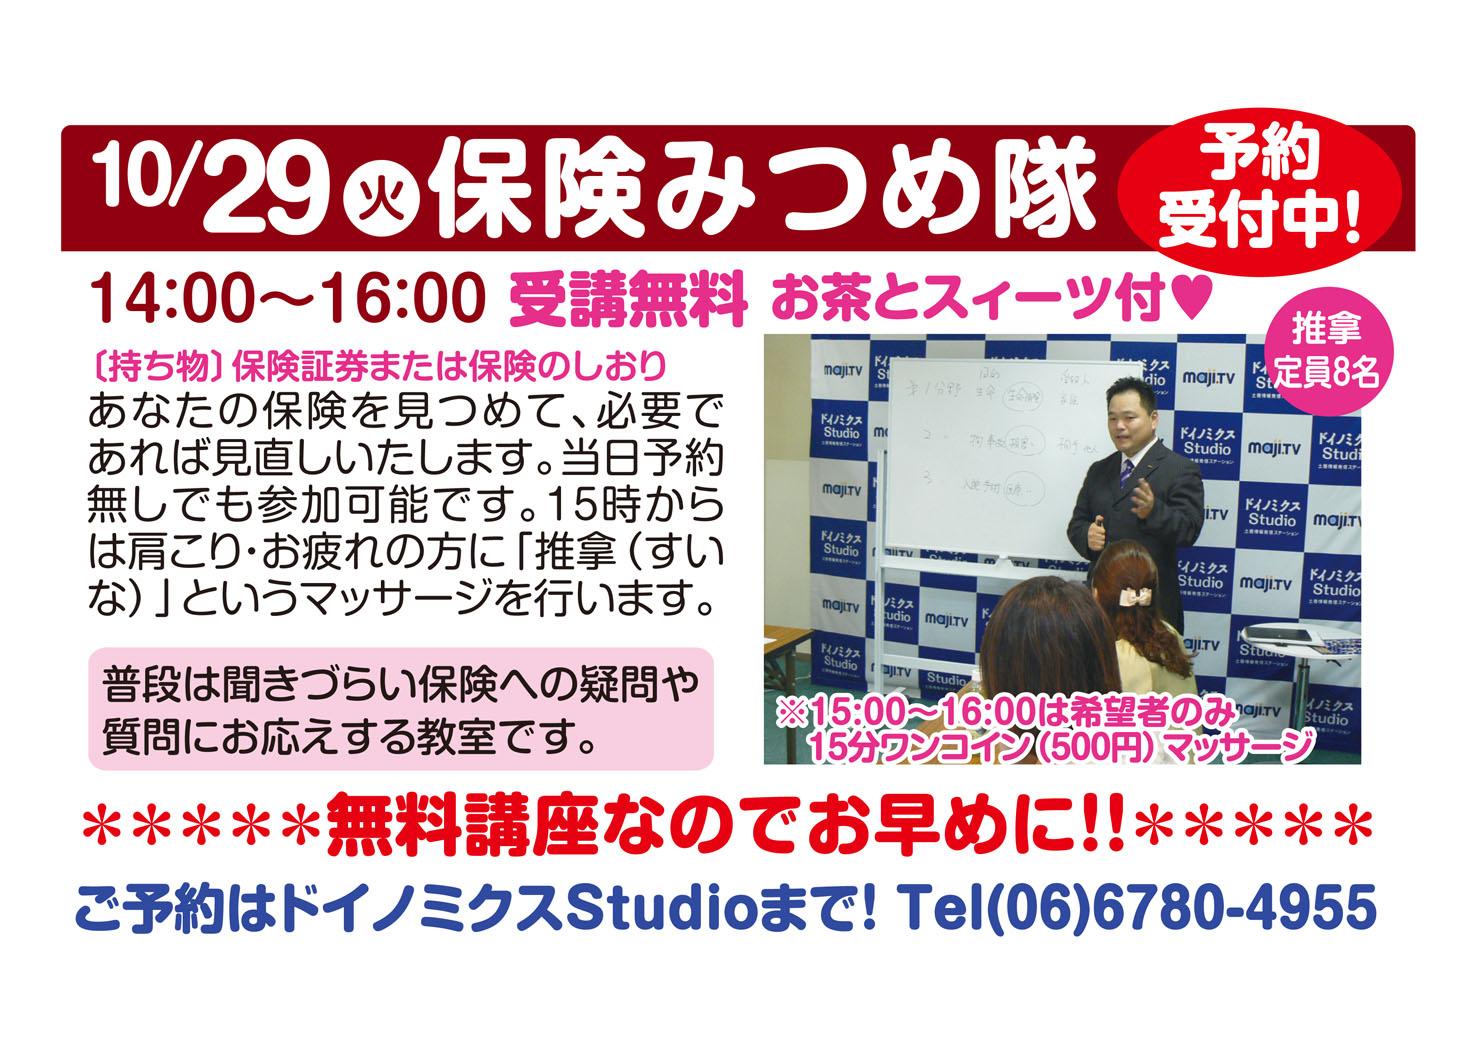 201310281425508fa.jpg